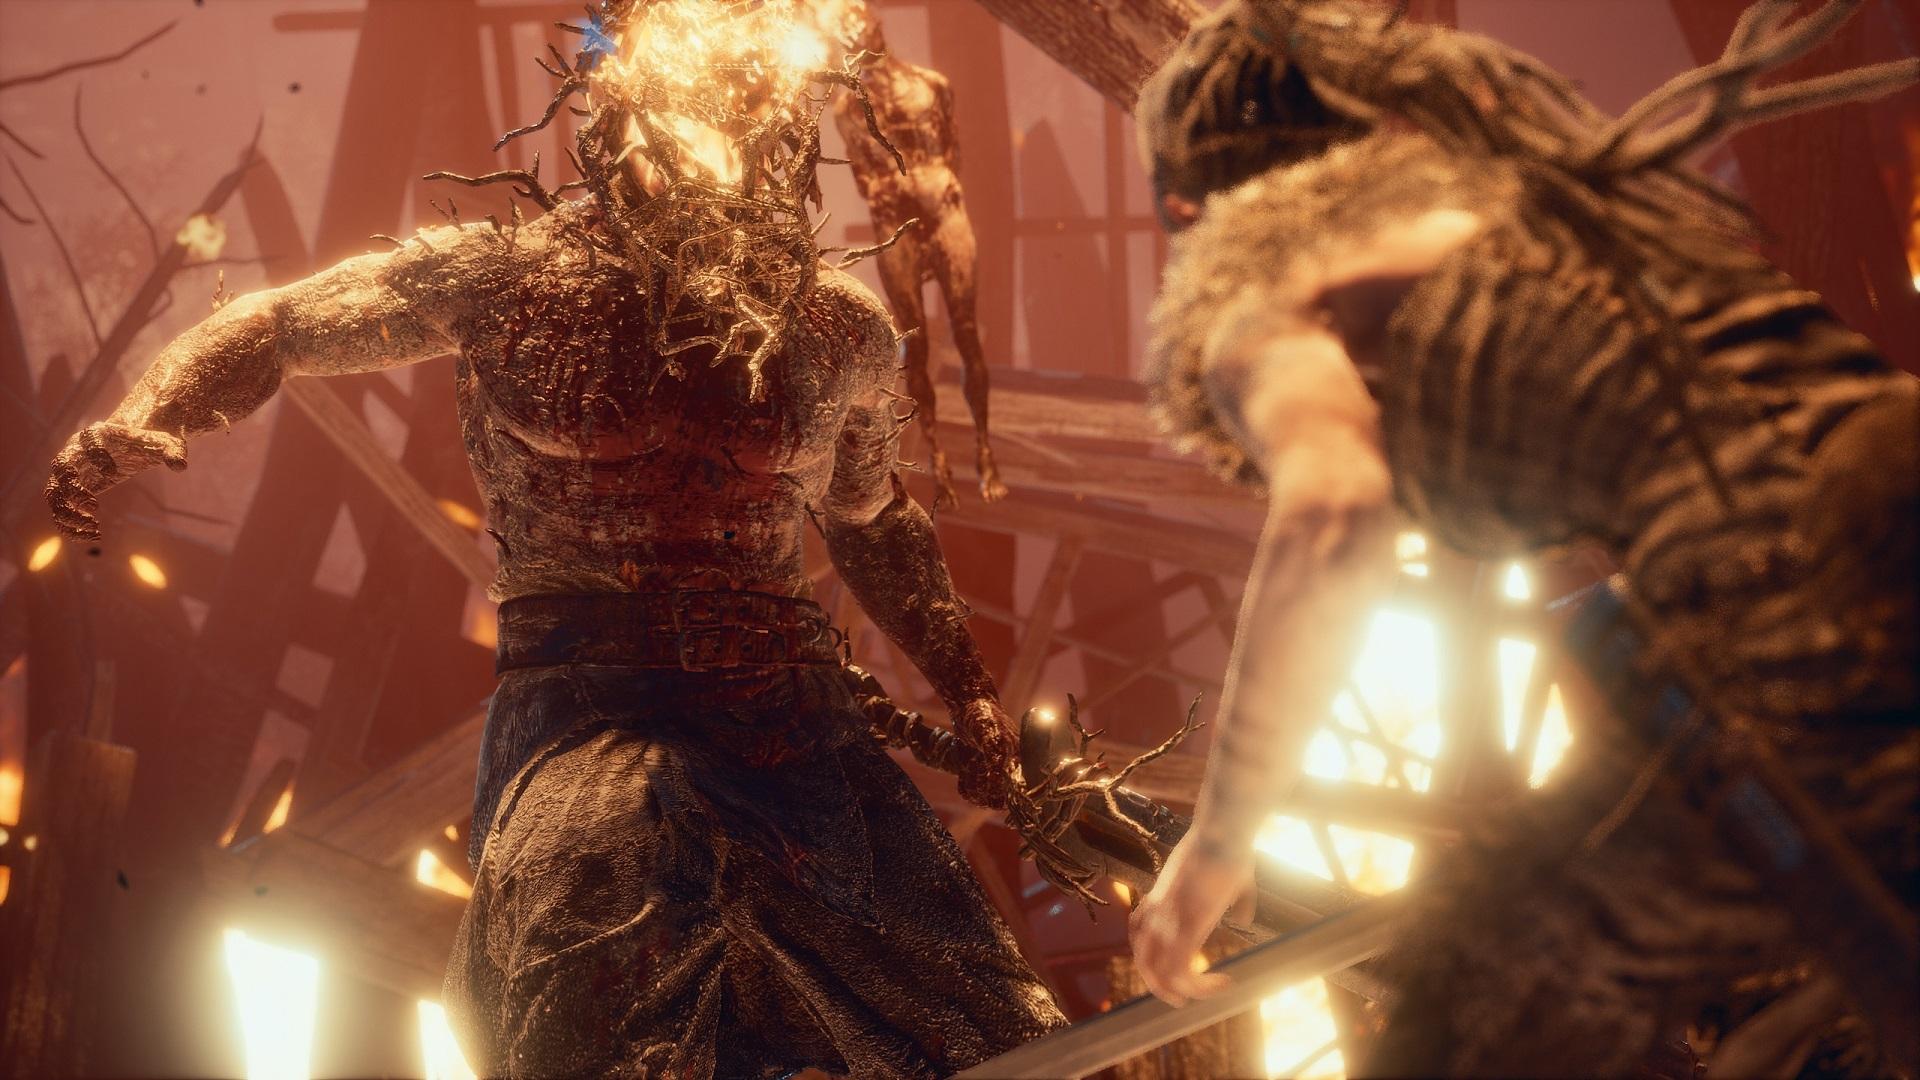 hellblade-senuas-sacrifice-pc-screenshot-02